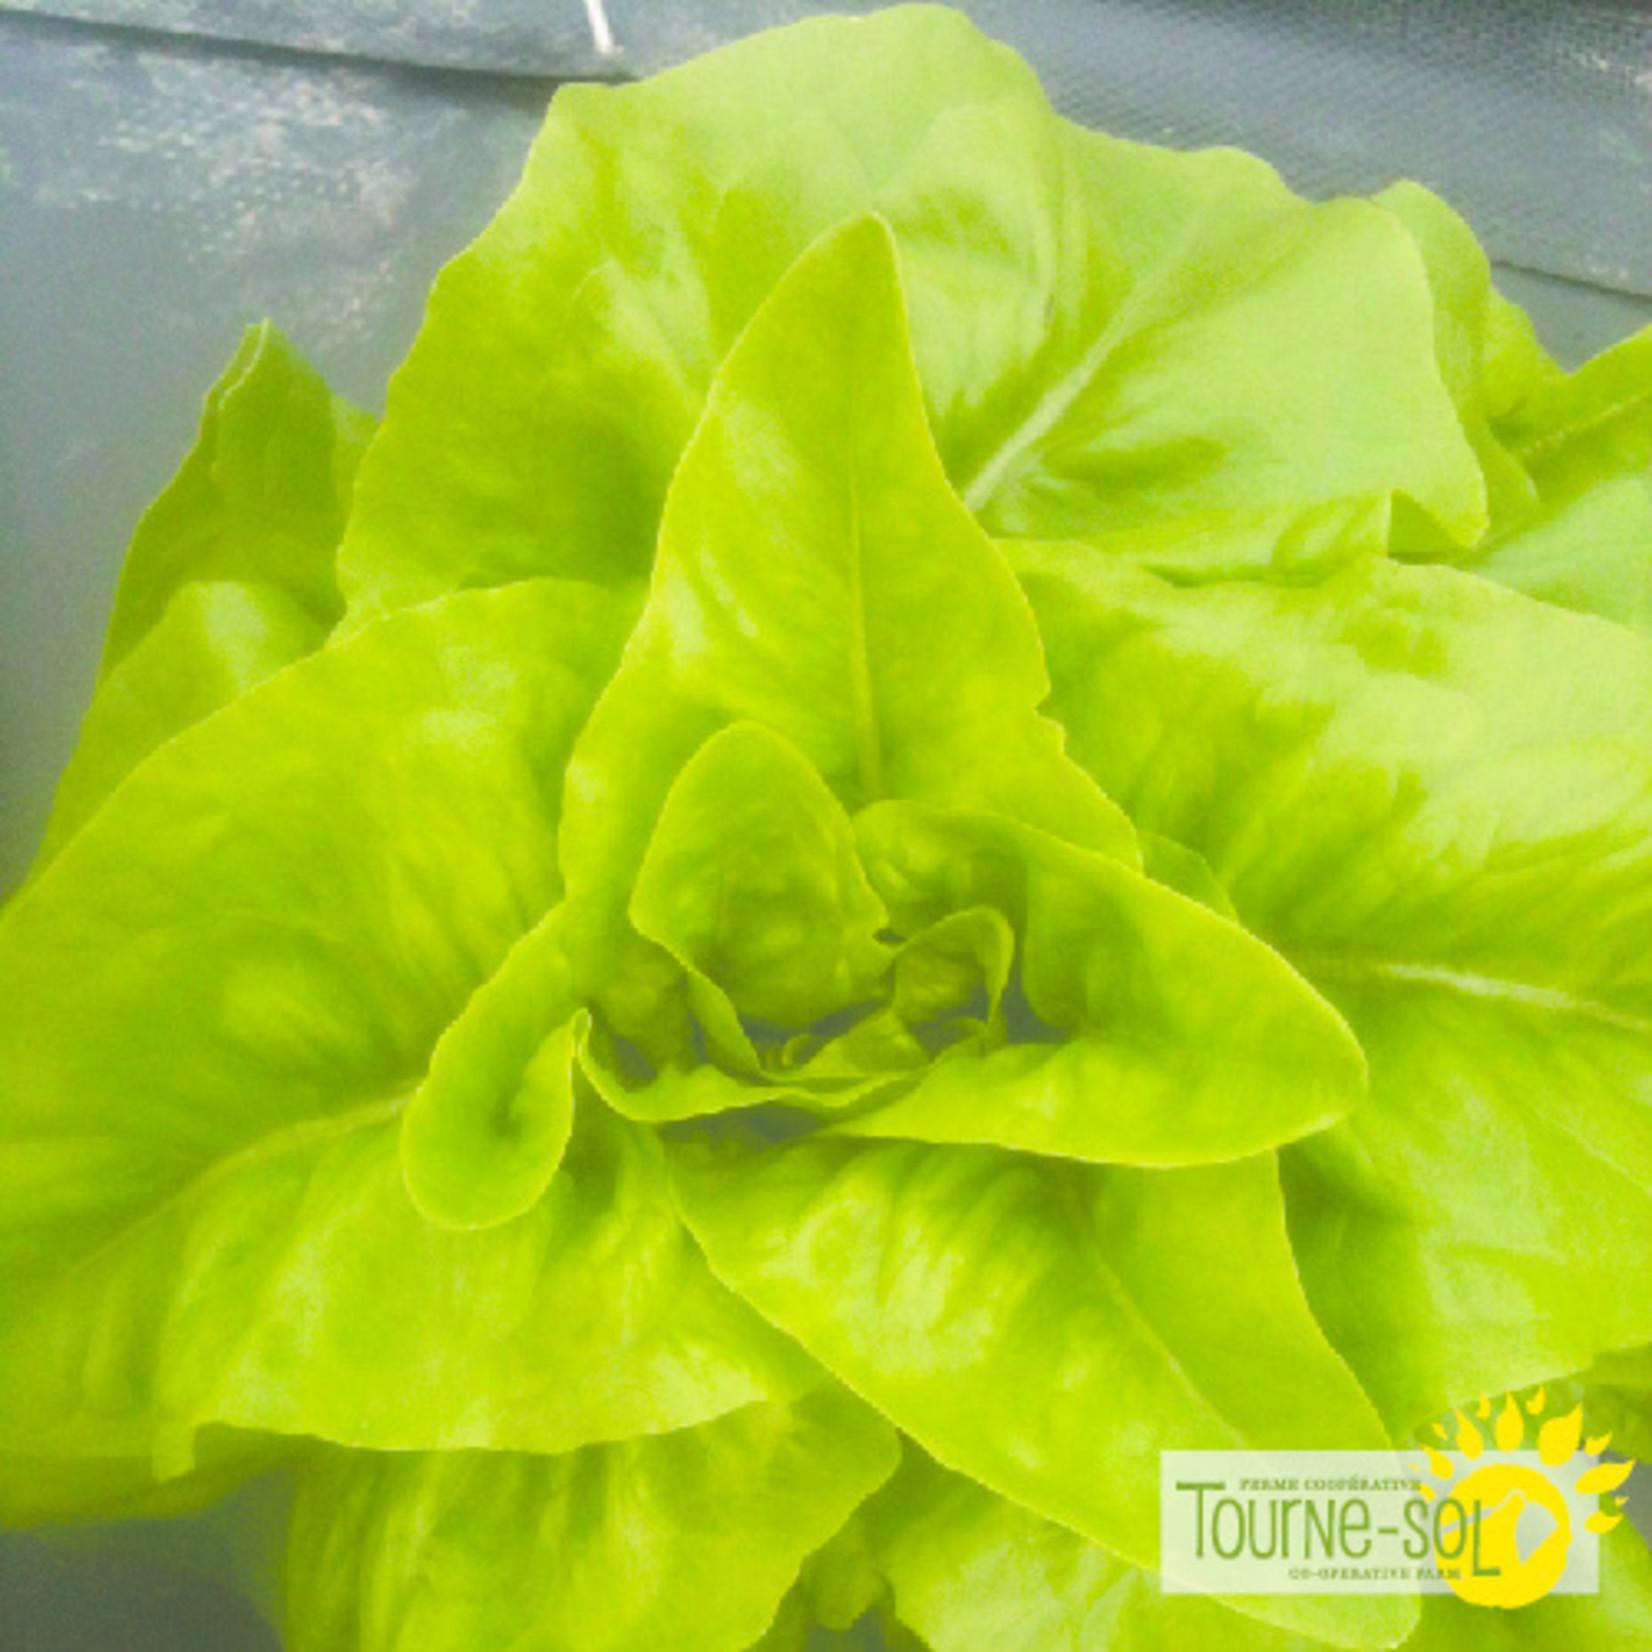 Tourne-Sol Deer Tongue green lettuce